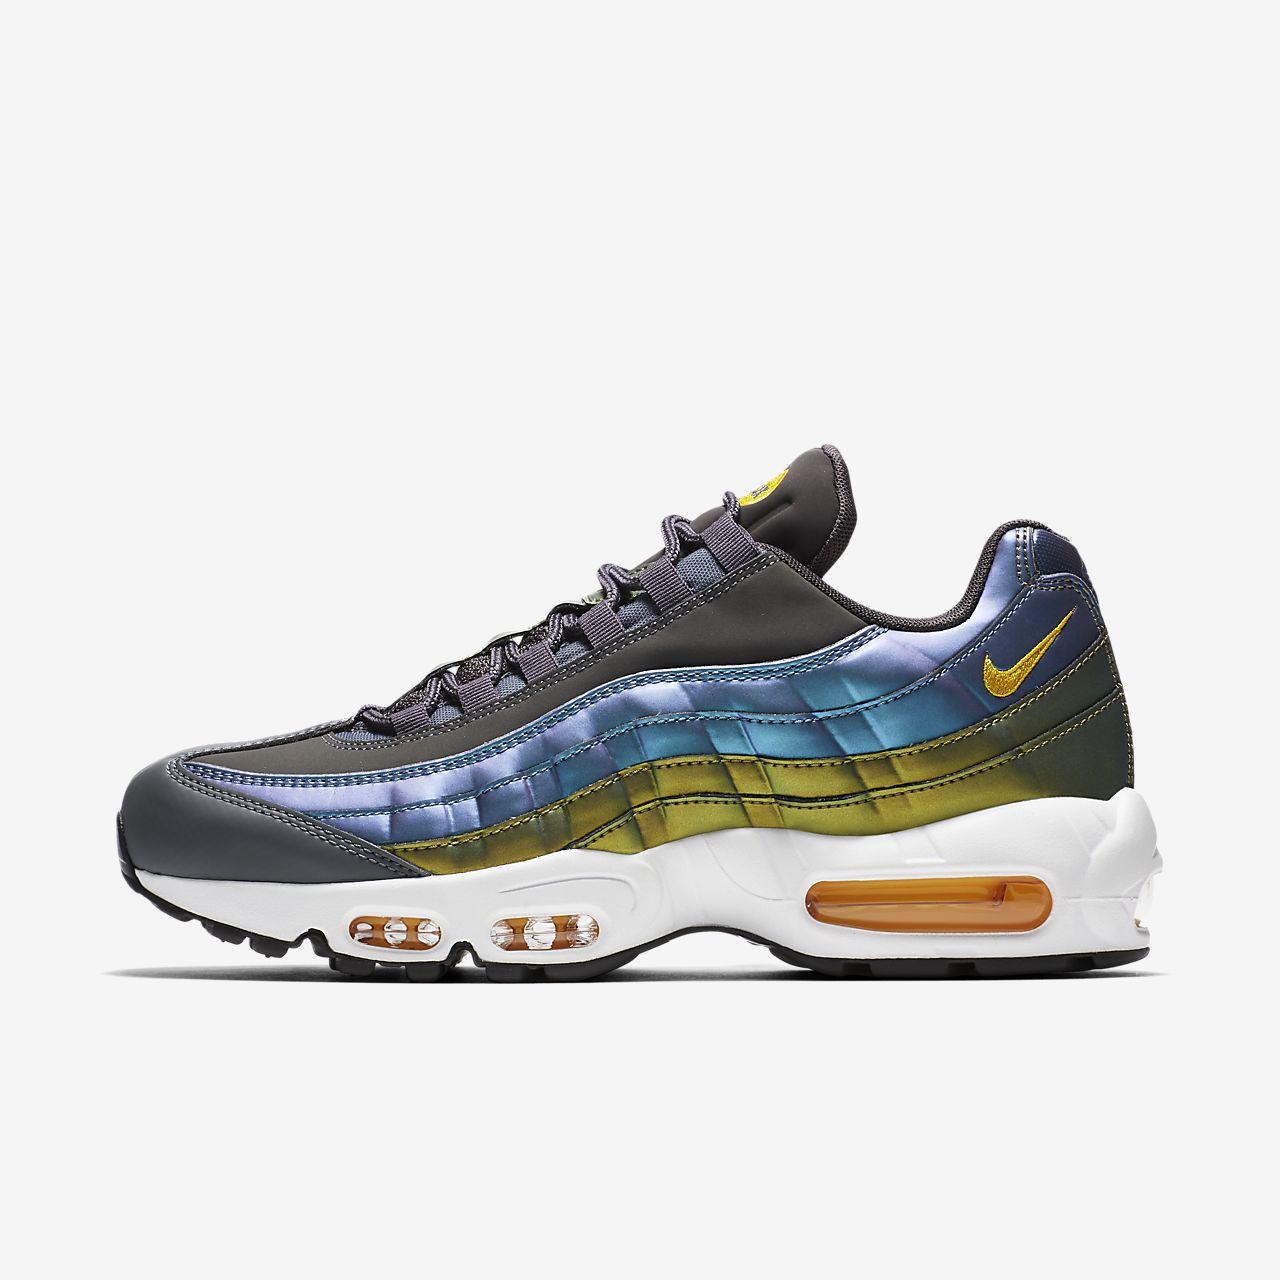 a3bb3533c832 Nike Air Max 95 Premium Men s Shoe. Nike.com VN